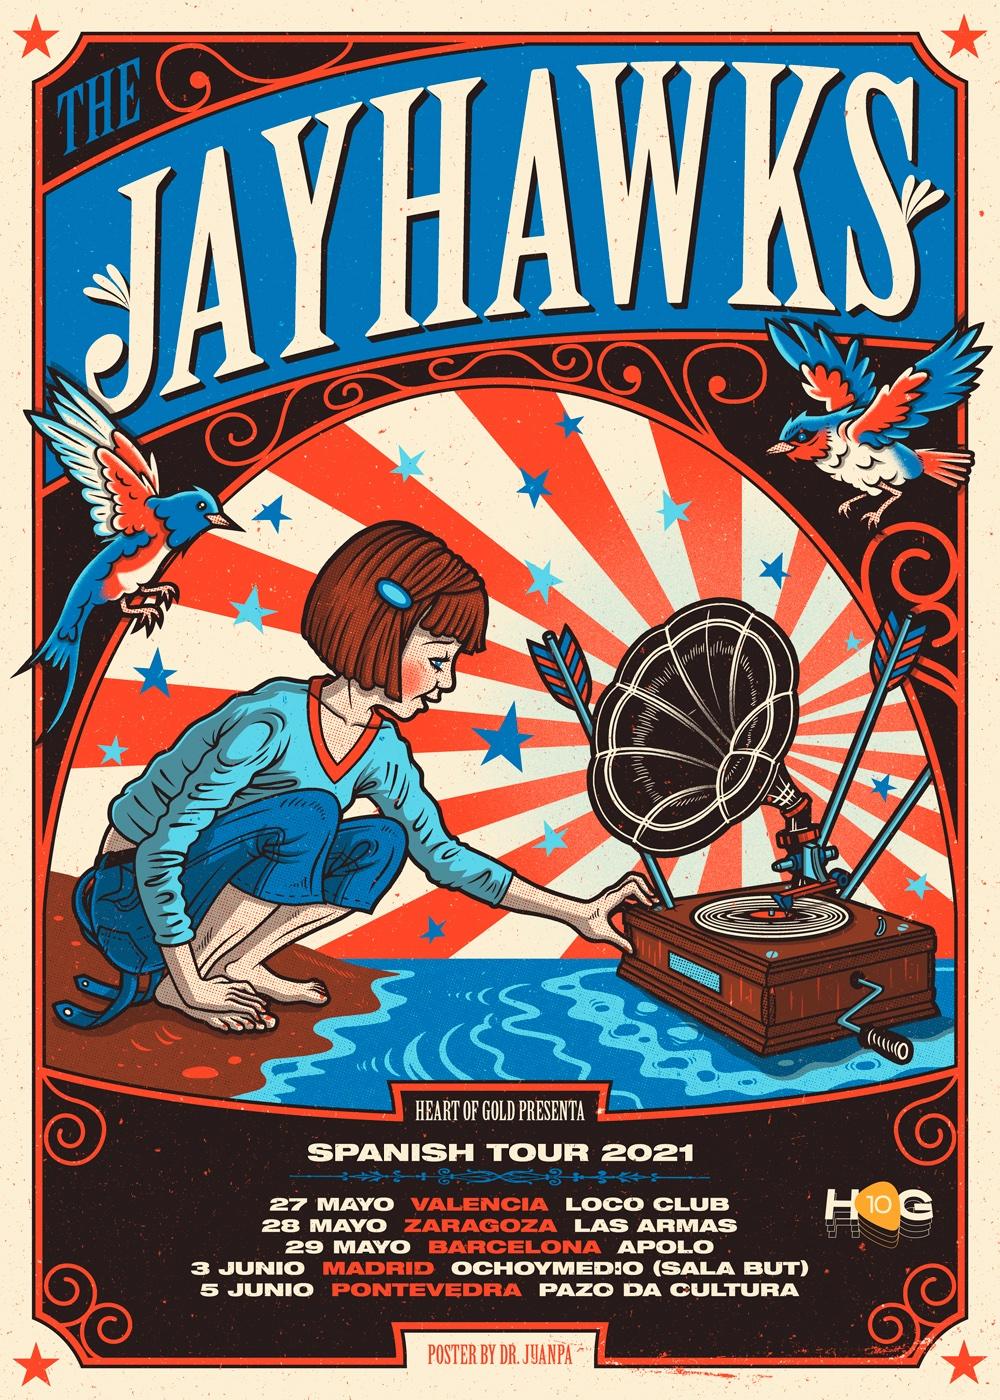 The Jayhawks - Página 3 EXU8PivUMAAZCC4?format=jpg&name=large